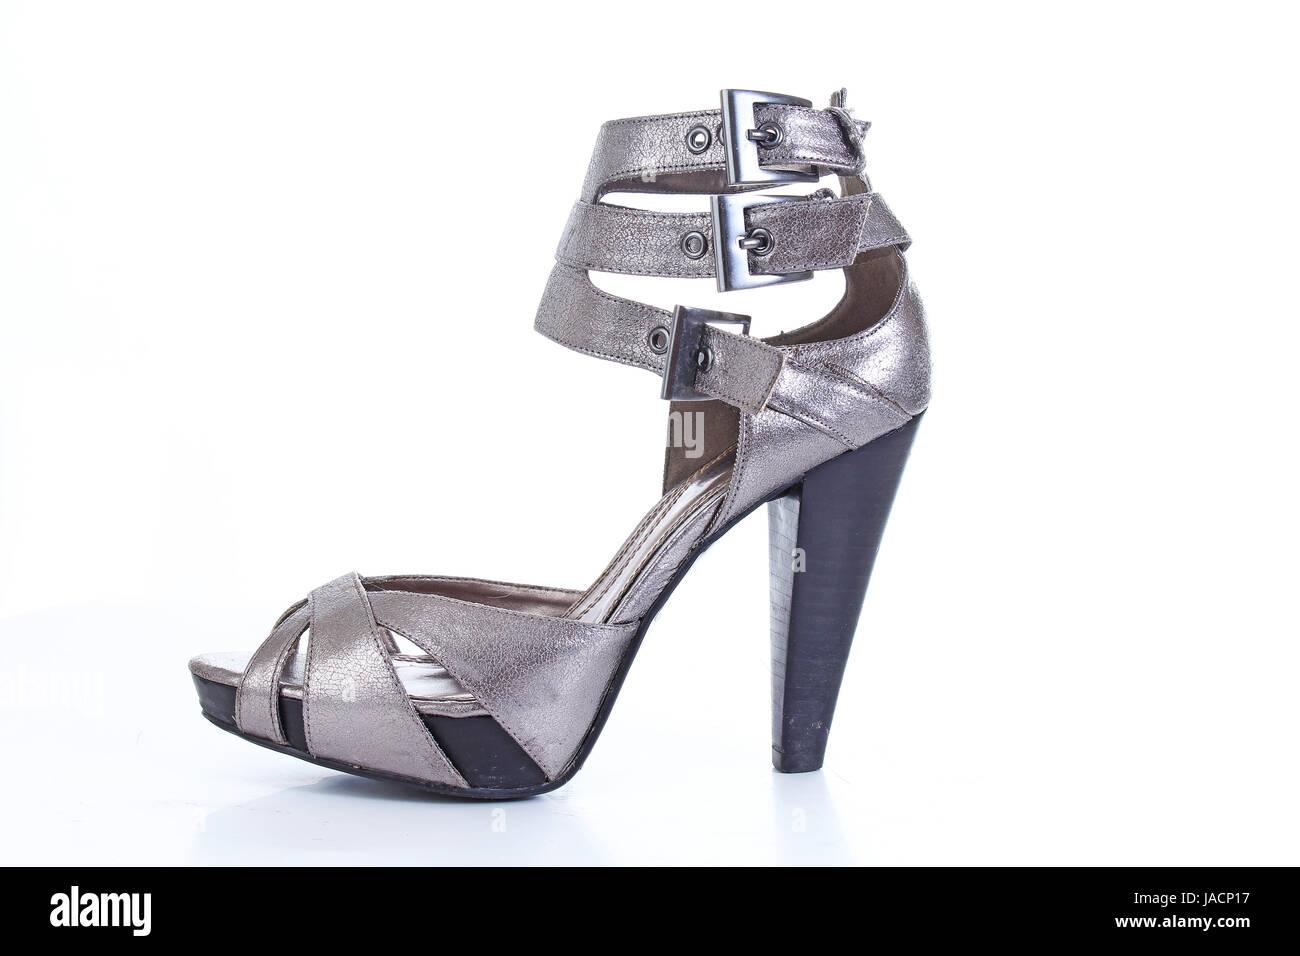 Silver sandal high heel shoe. Grey high heels. - Stock Image